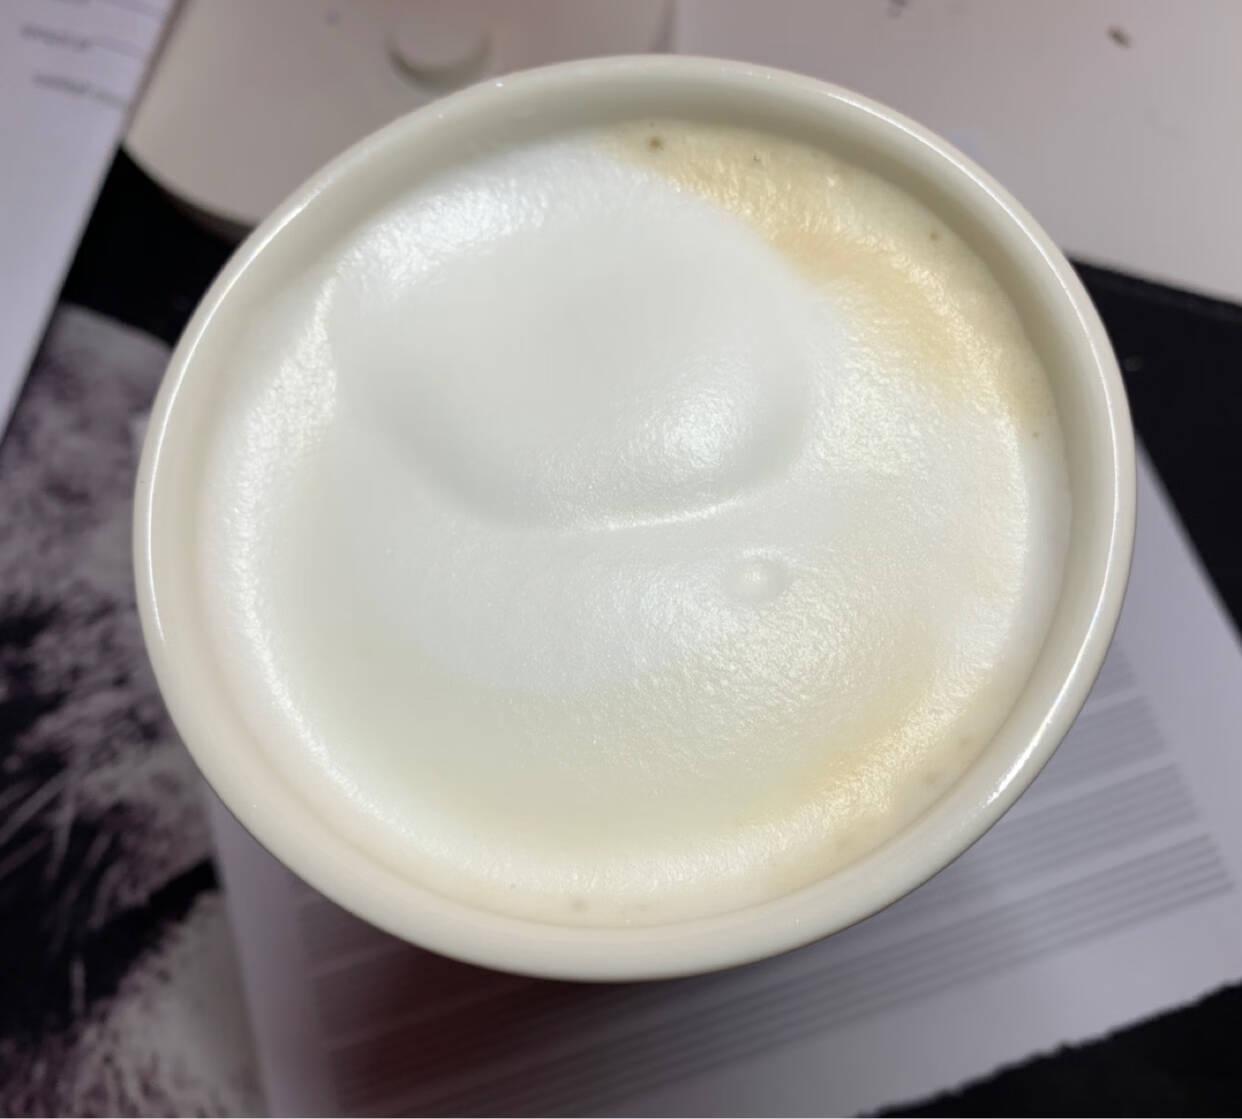 Hero云雀奶茶机电动打奶器家用全自动打泡器冷热咖啡机牛奶奶泡机搅拌杯奶茶奶泡一体机Hero云雀奶茶机